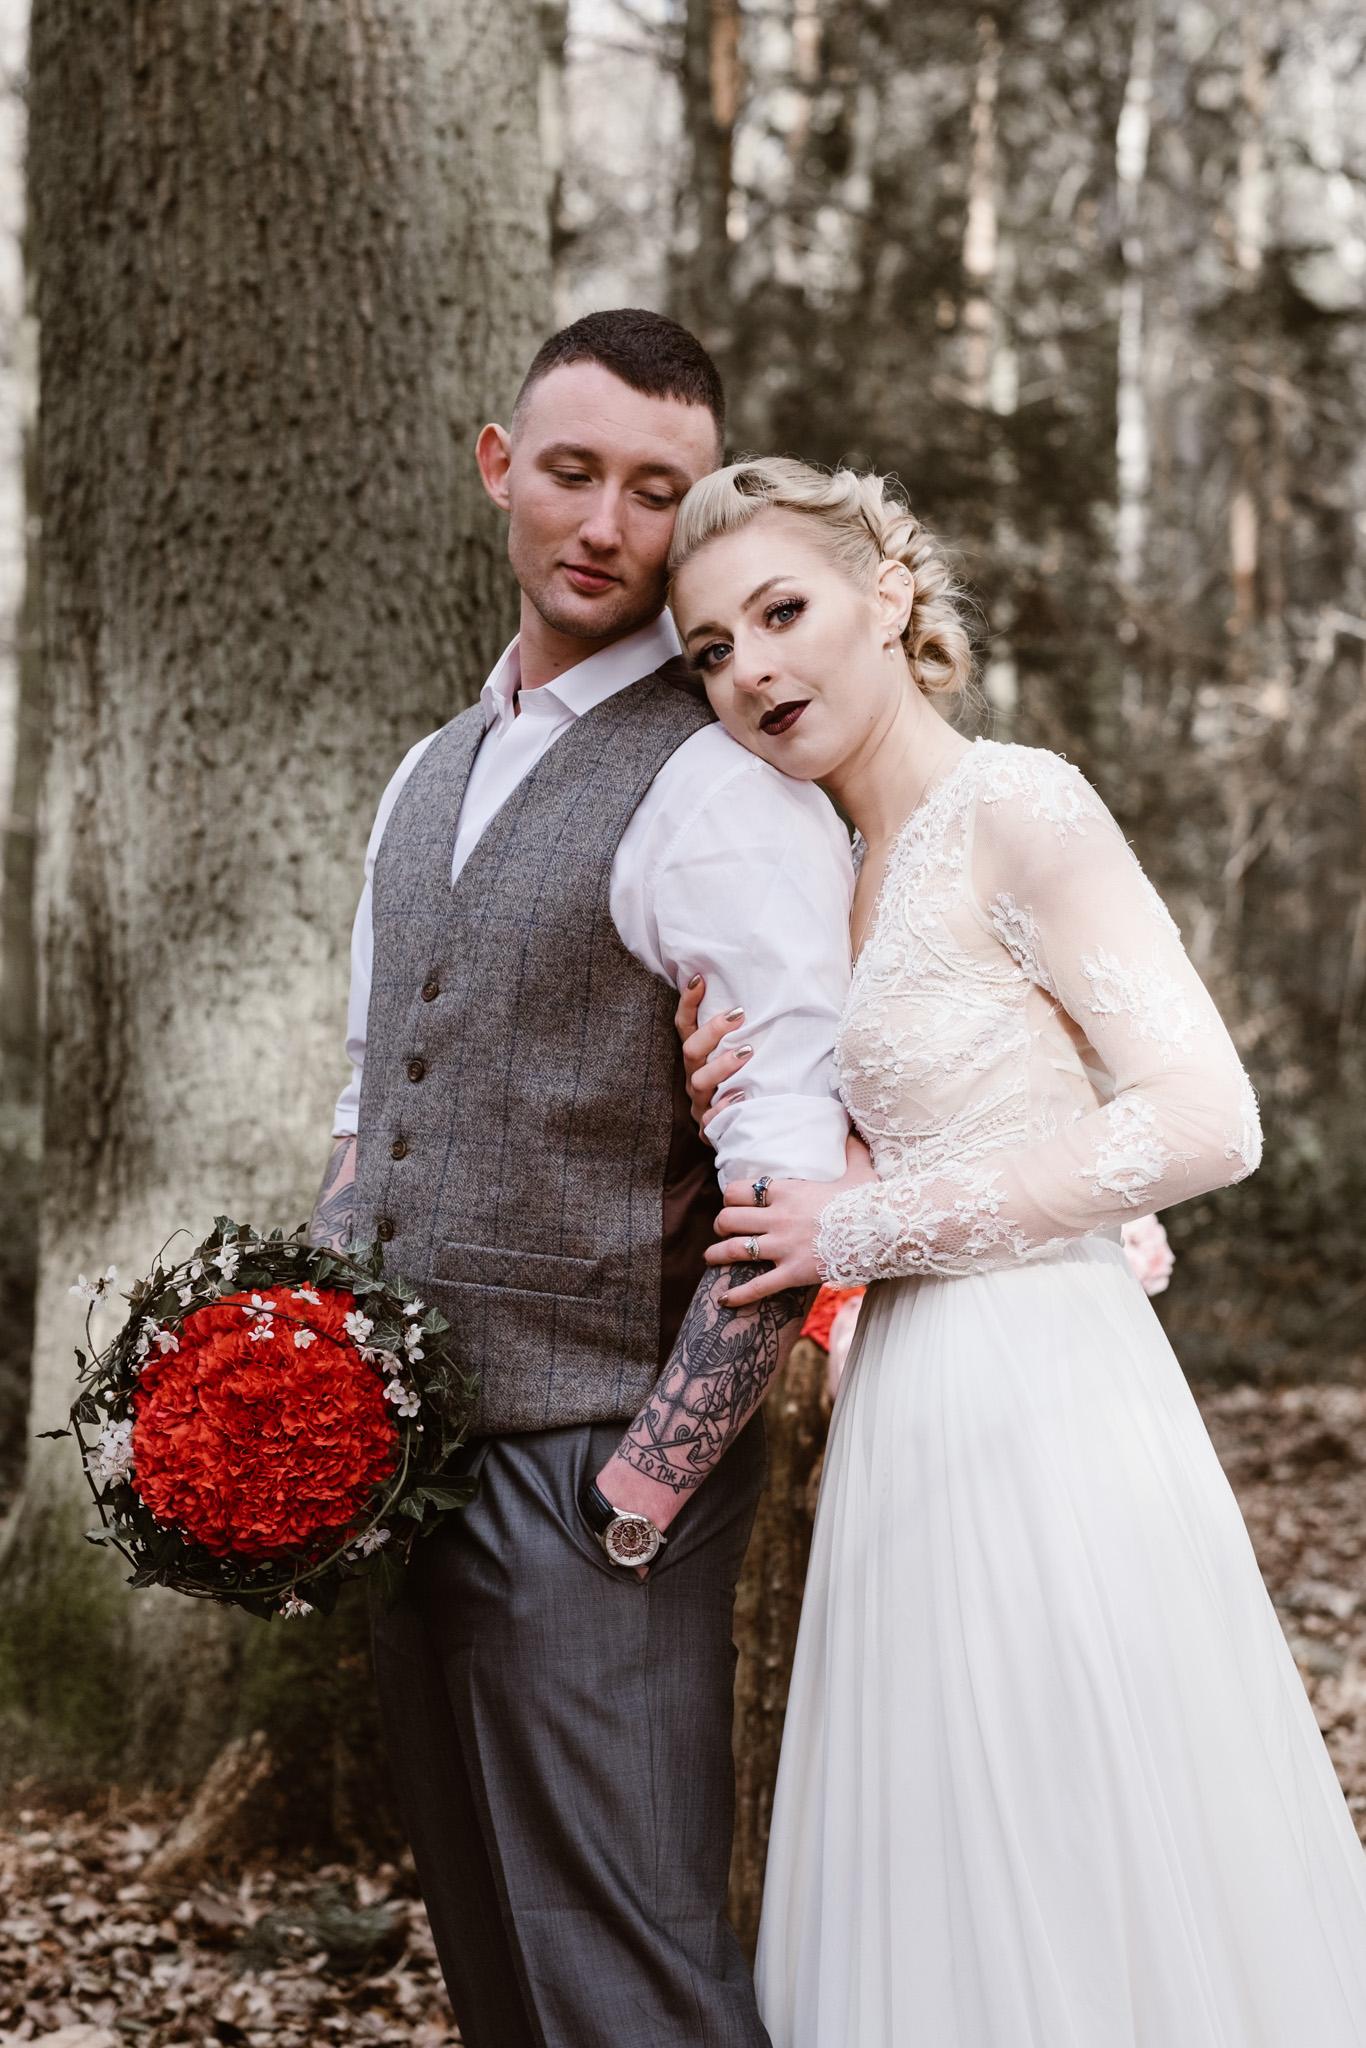 Captains-Wood-Barn-Alterative-Rustic-Vintage-Essex-Wedding-Suffolk-Grace-Elizabeth-45.jpg